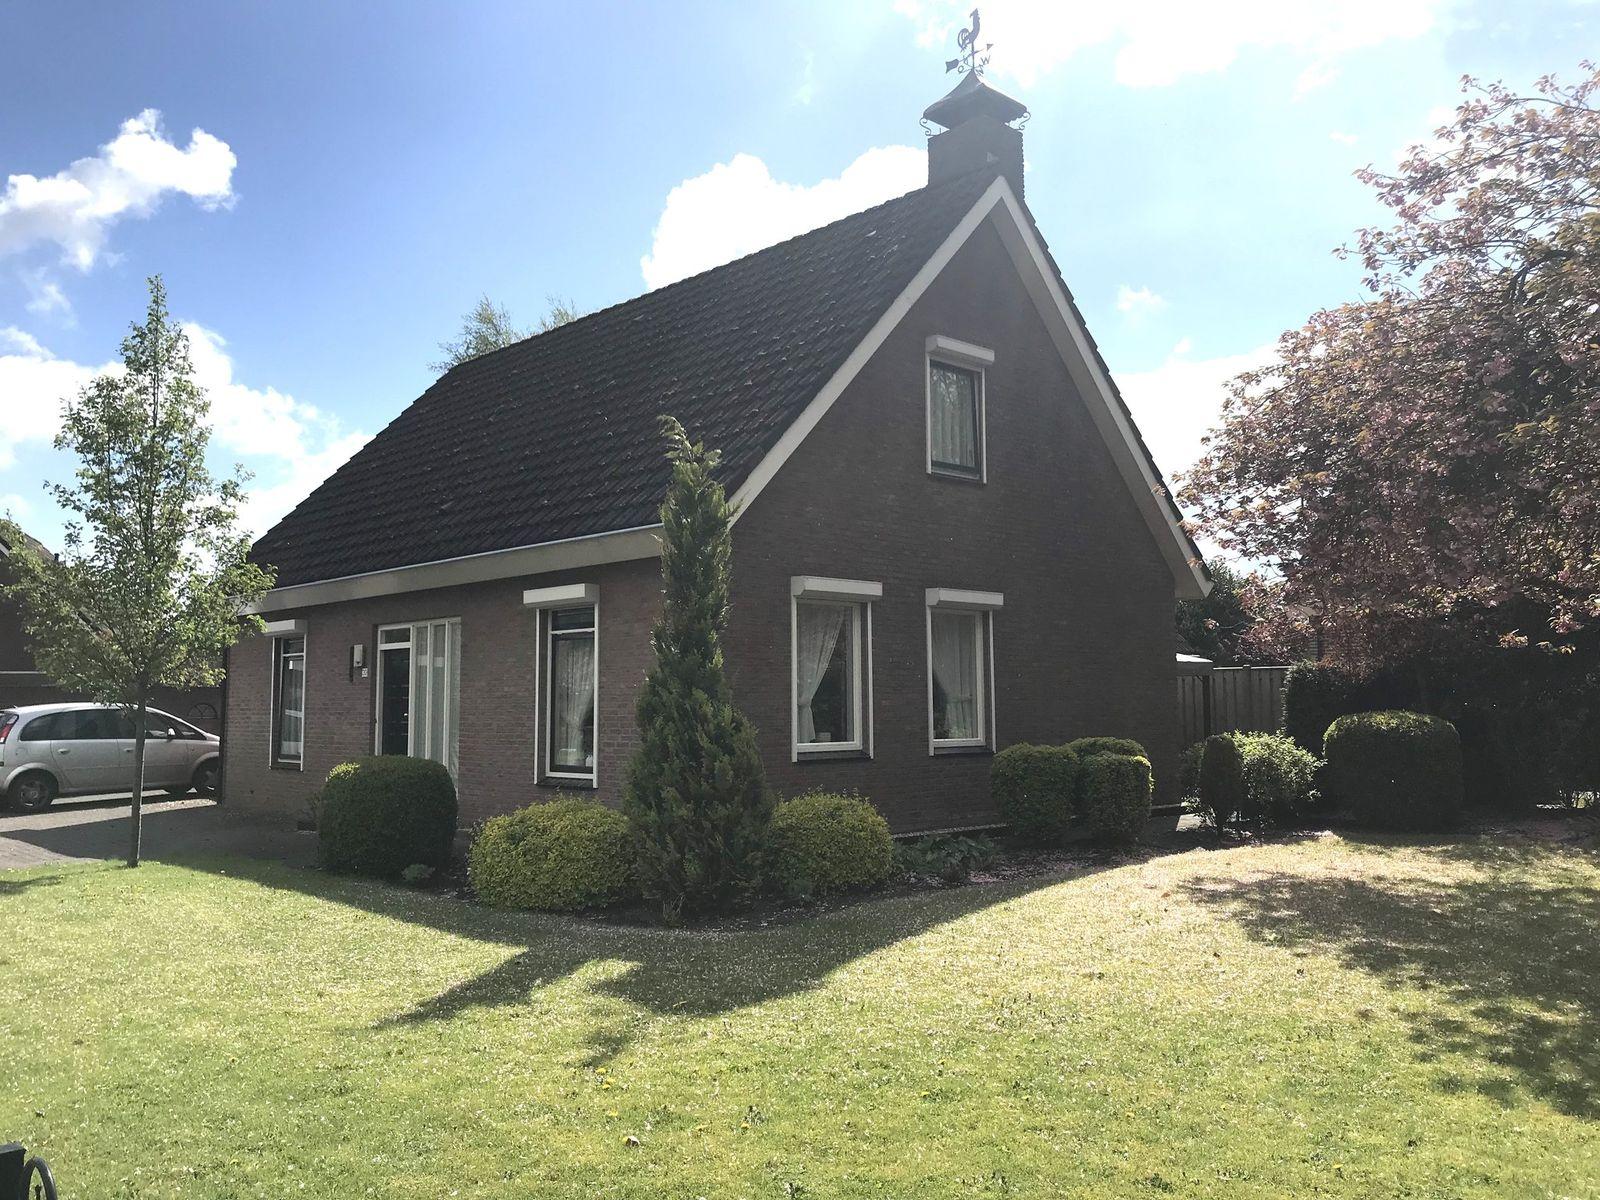 Zandlaan 30, Nieuw-amsterdam